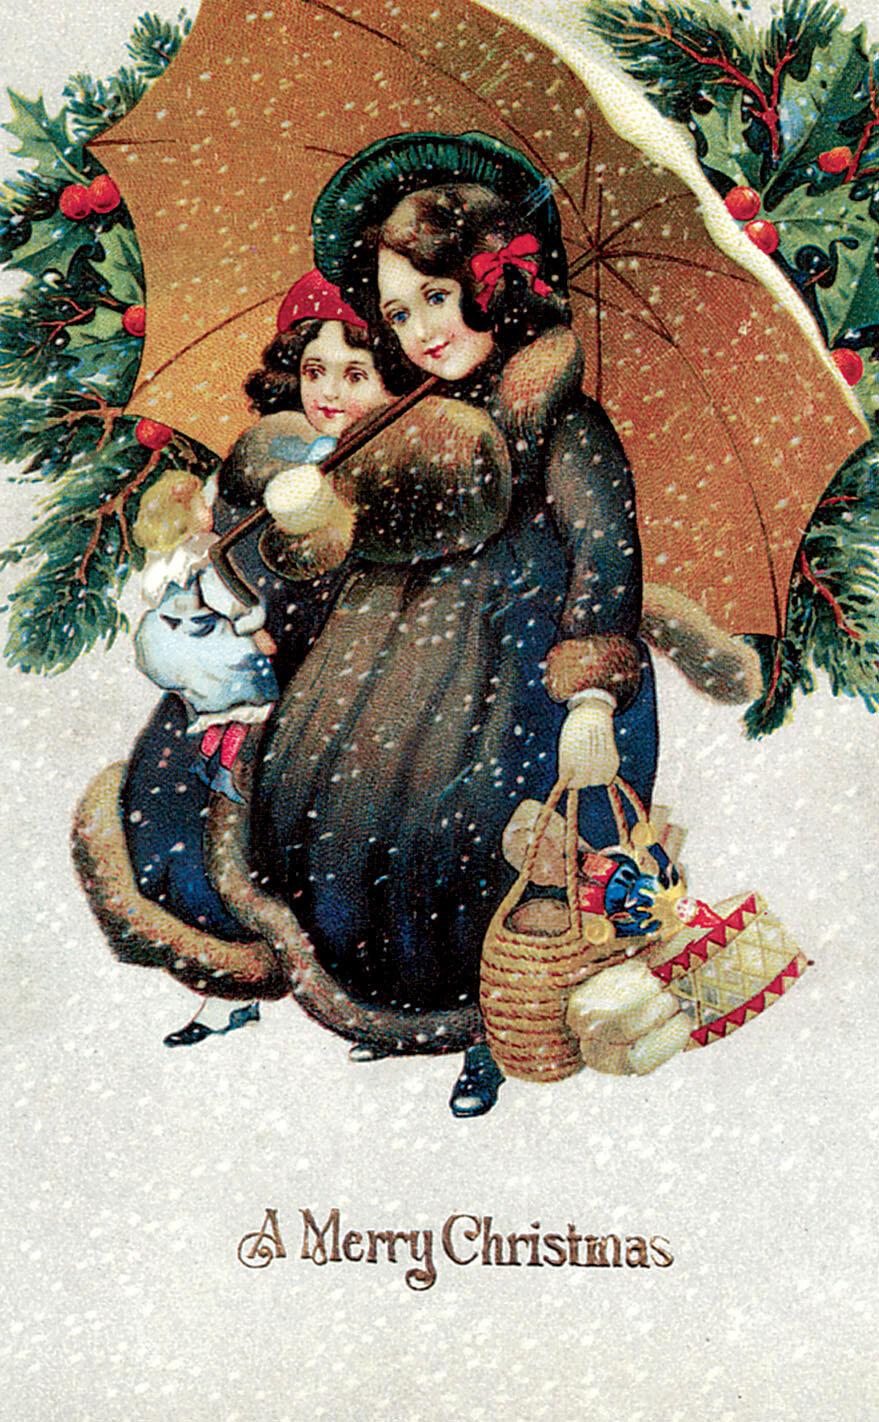 Картинки ретро открыток новогодних, флешку картинку картинки